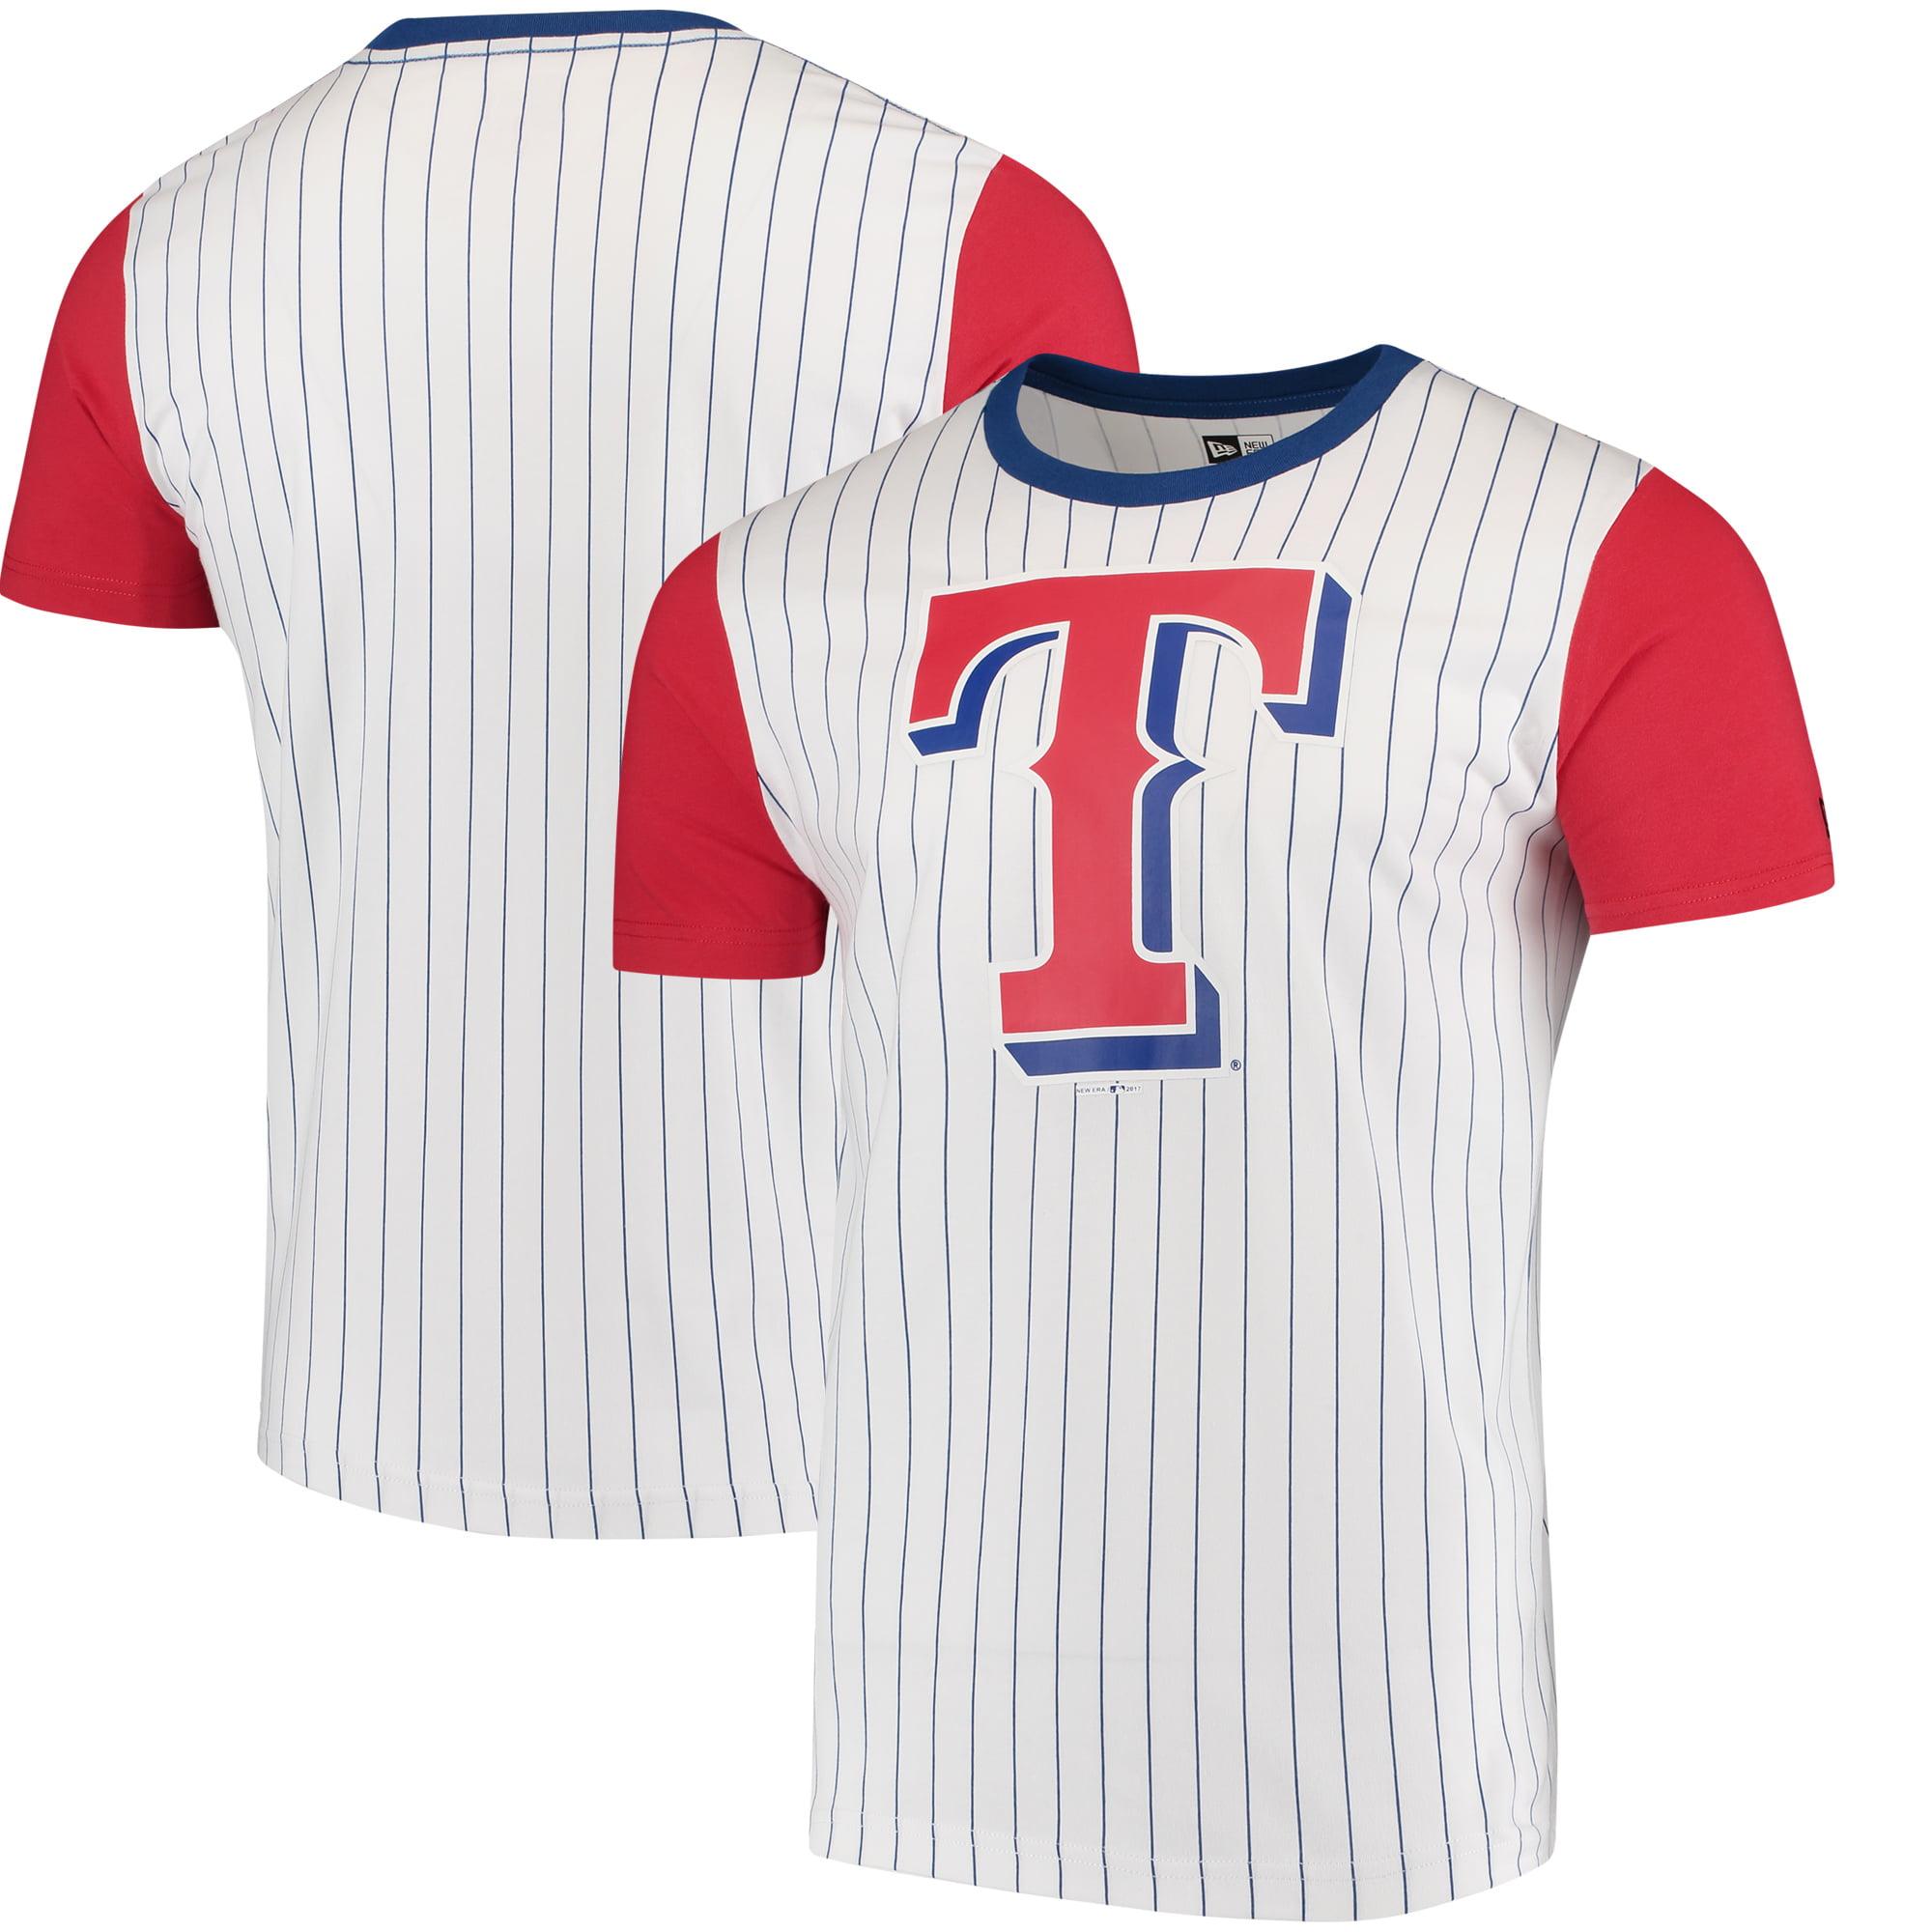 Texas Rangers New Era Pinstripe Baseball T-Shirt - White/Red